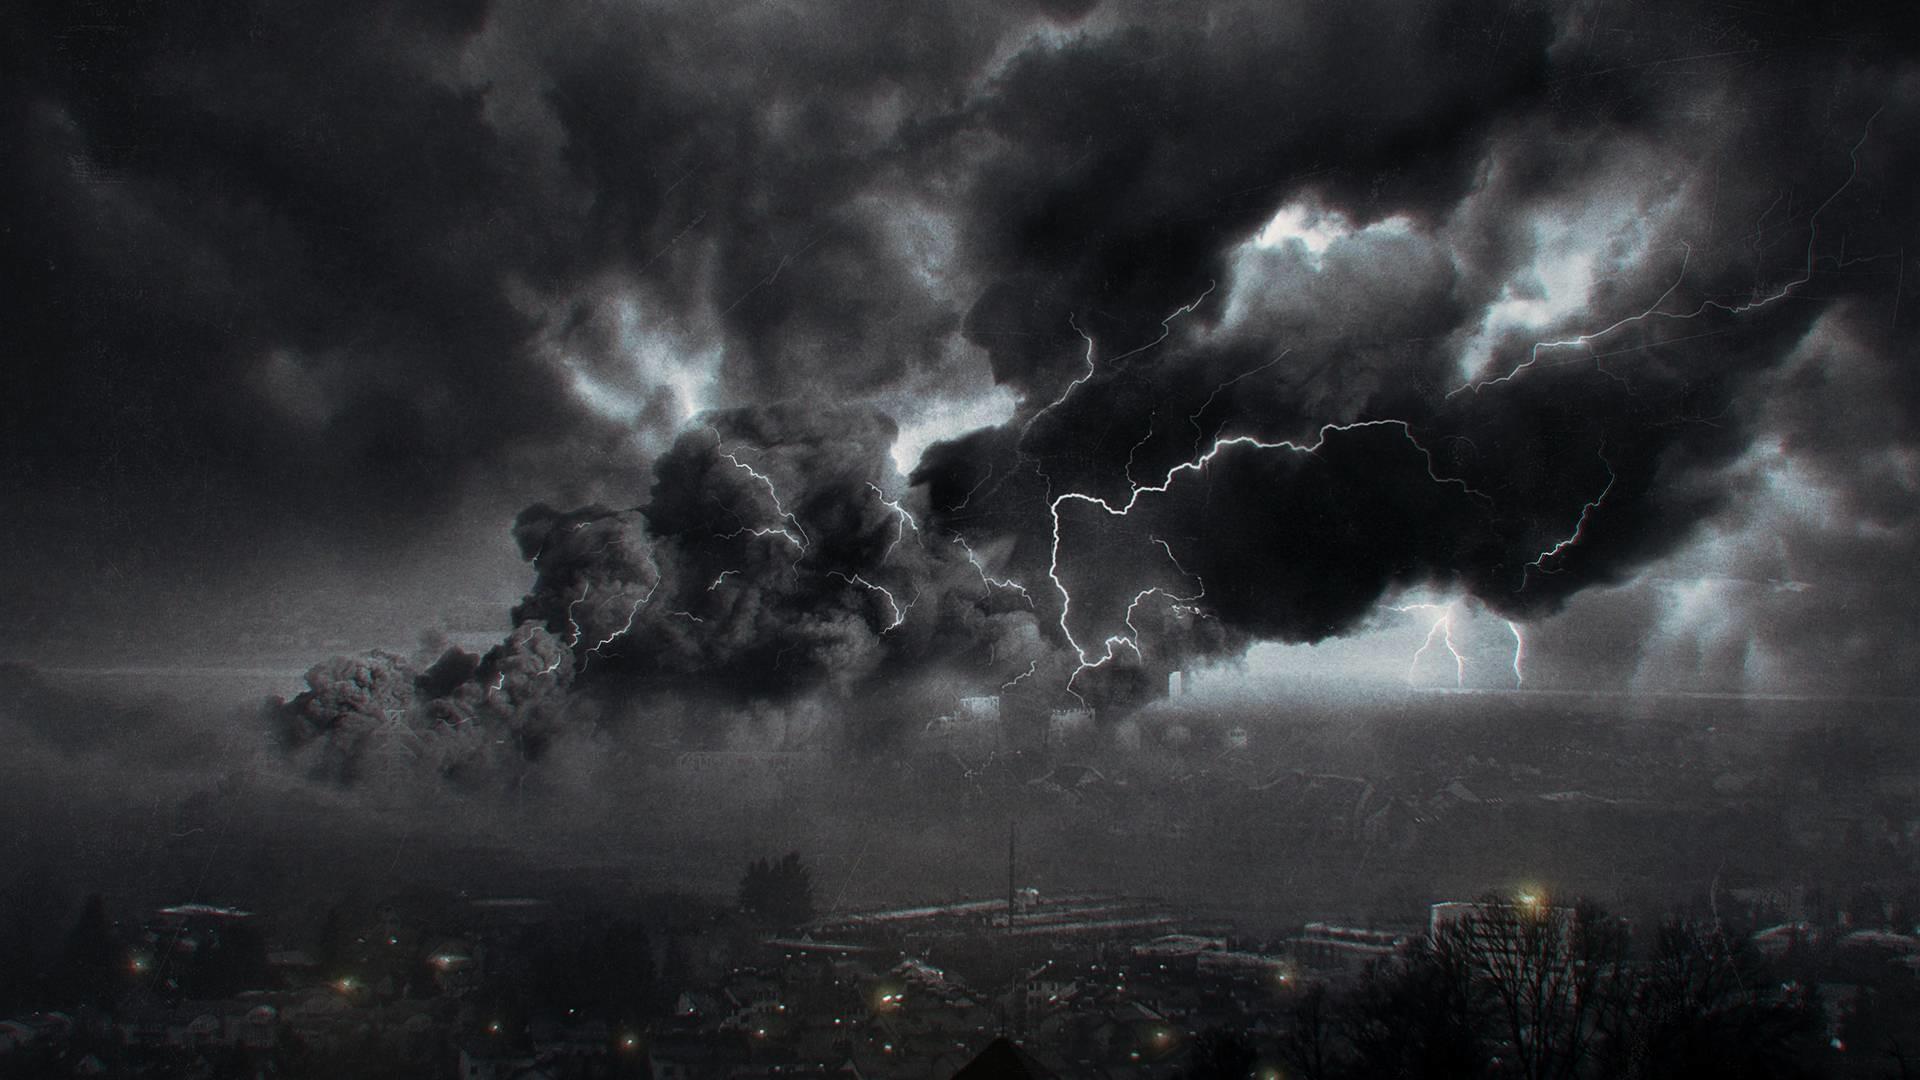 Free Wallpapers – Storm above big city wallpaper